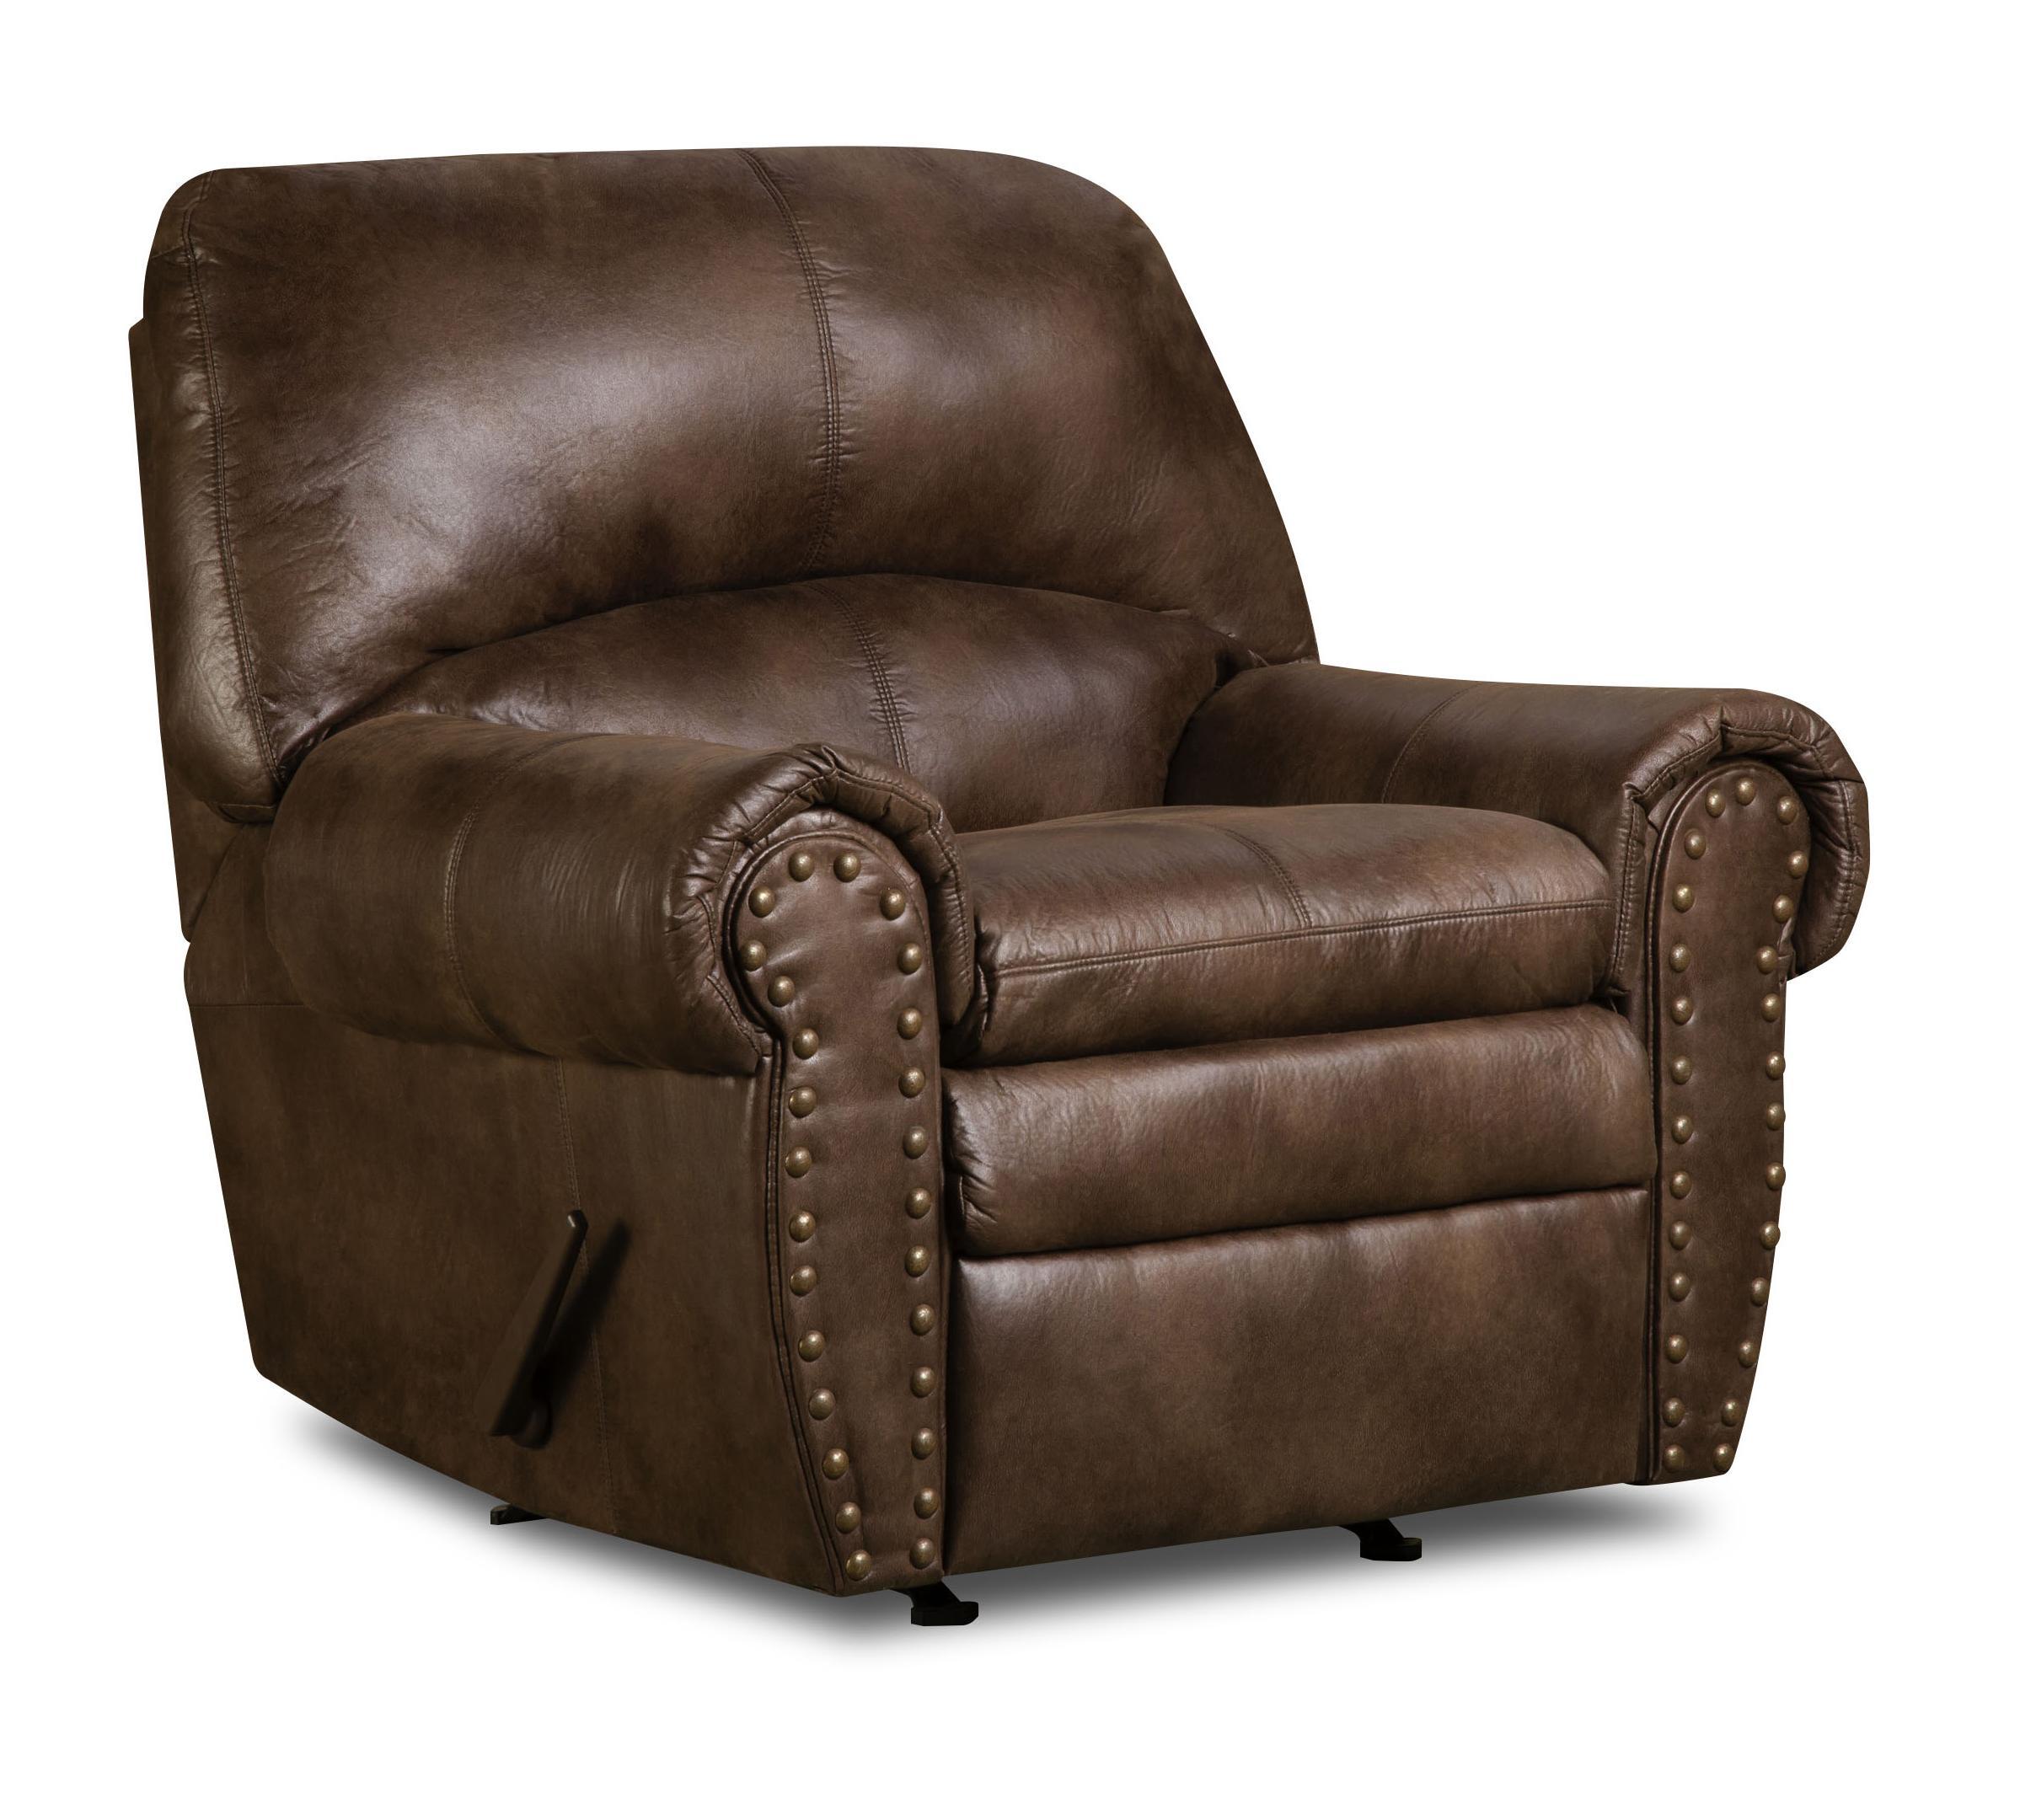 Simmons Upholstery 7510 Rocker Recliner - Item Number: 7510-Rocker-Espresso